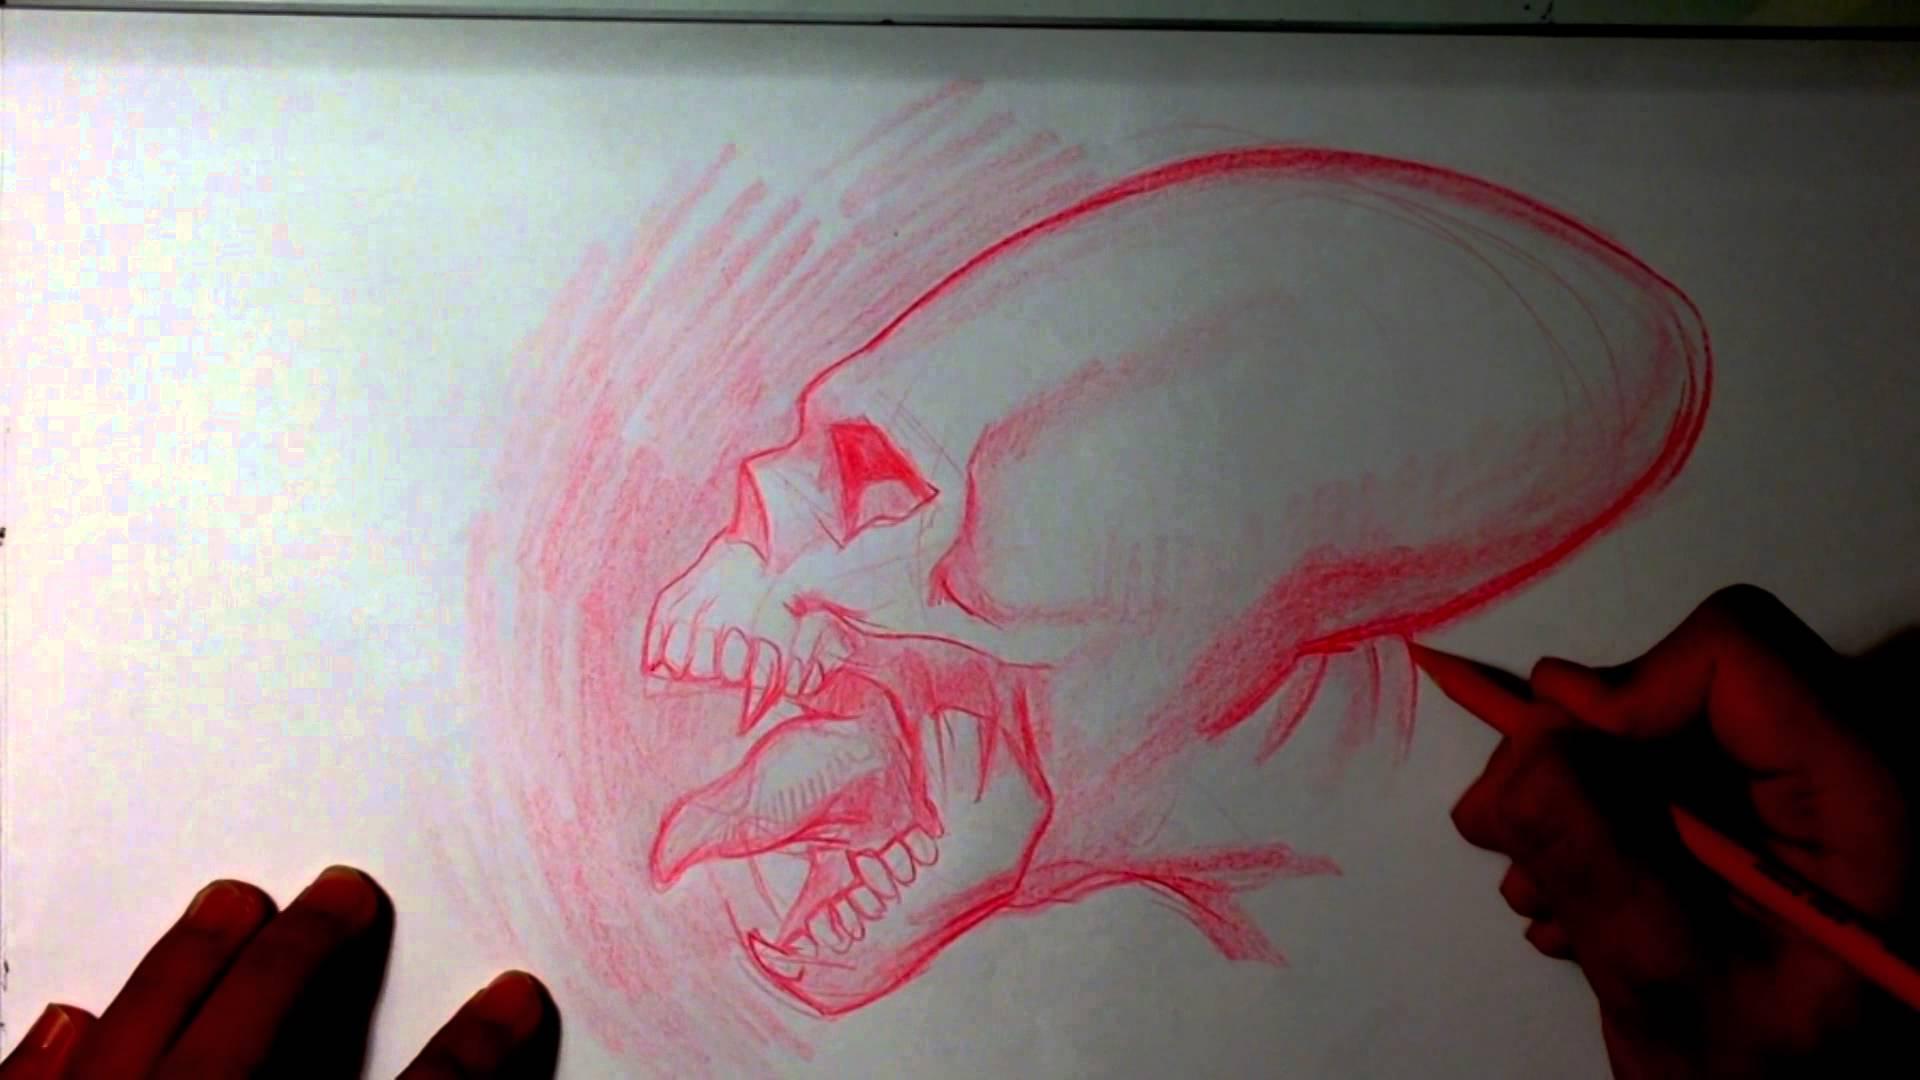 Drawn skull alien Skull YouTube Drawings Alien Skull